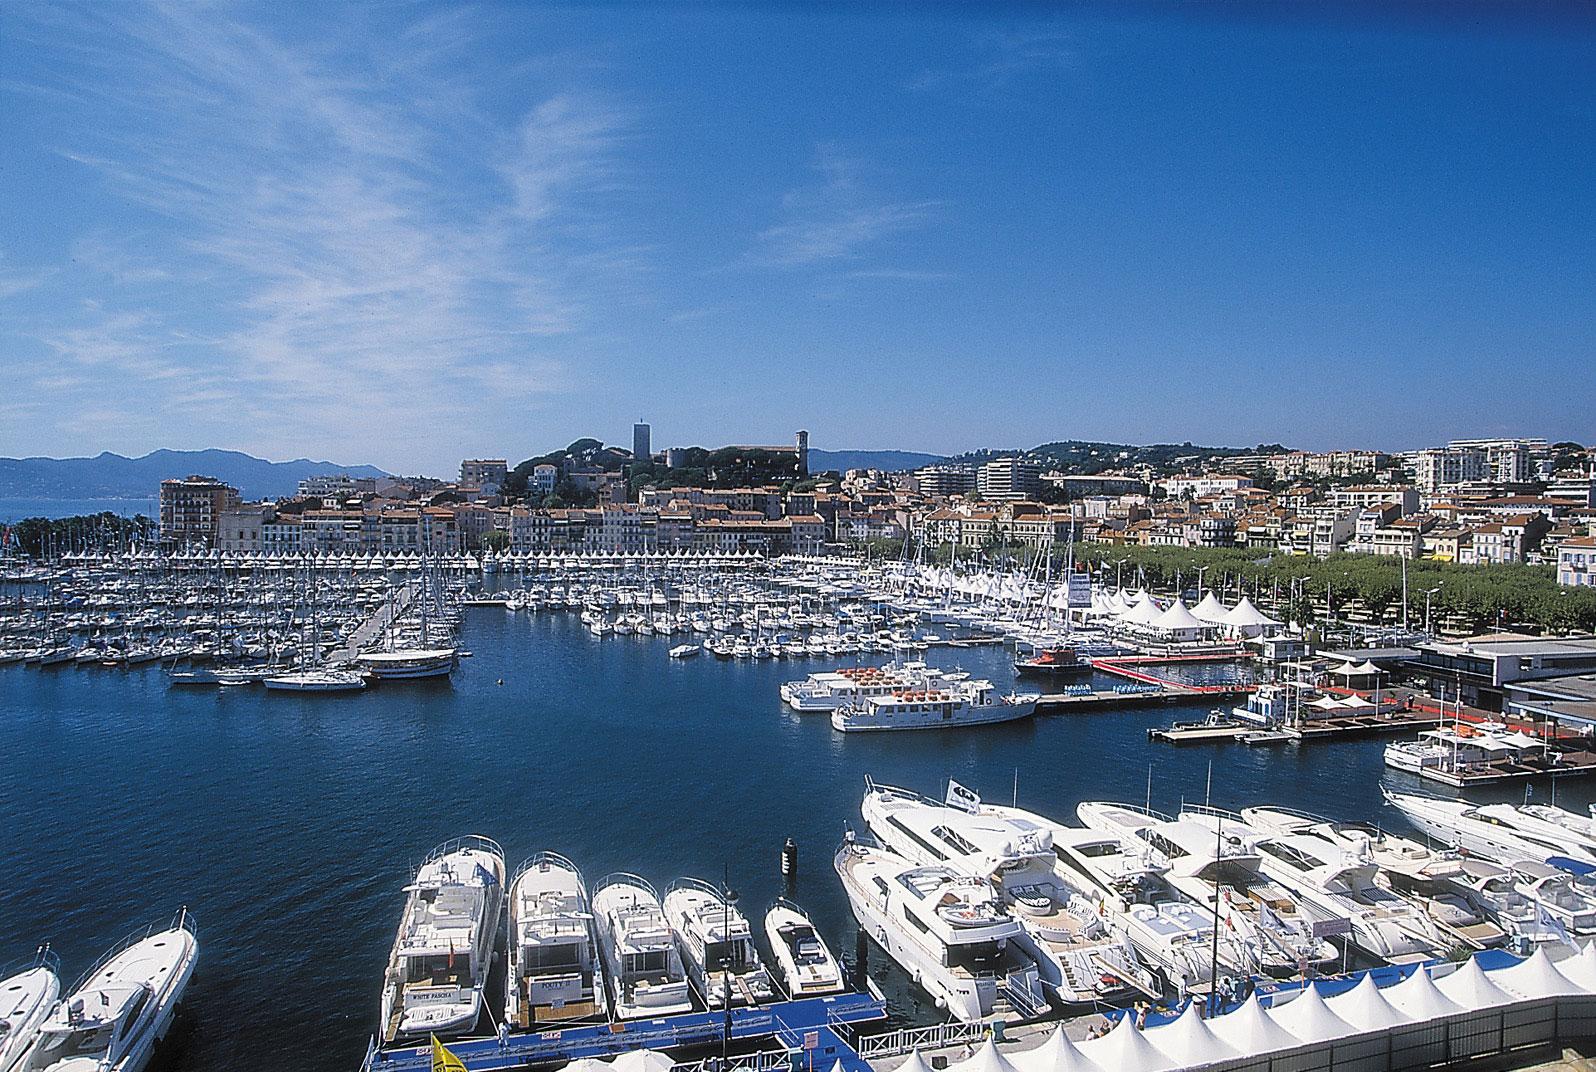 A Luxury Weekend Break On The Fabulous French Riviera – Cannes